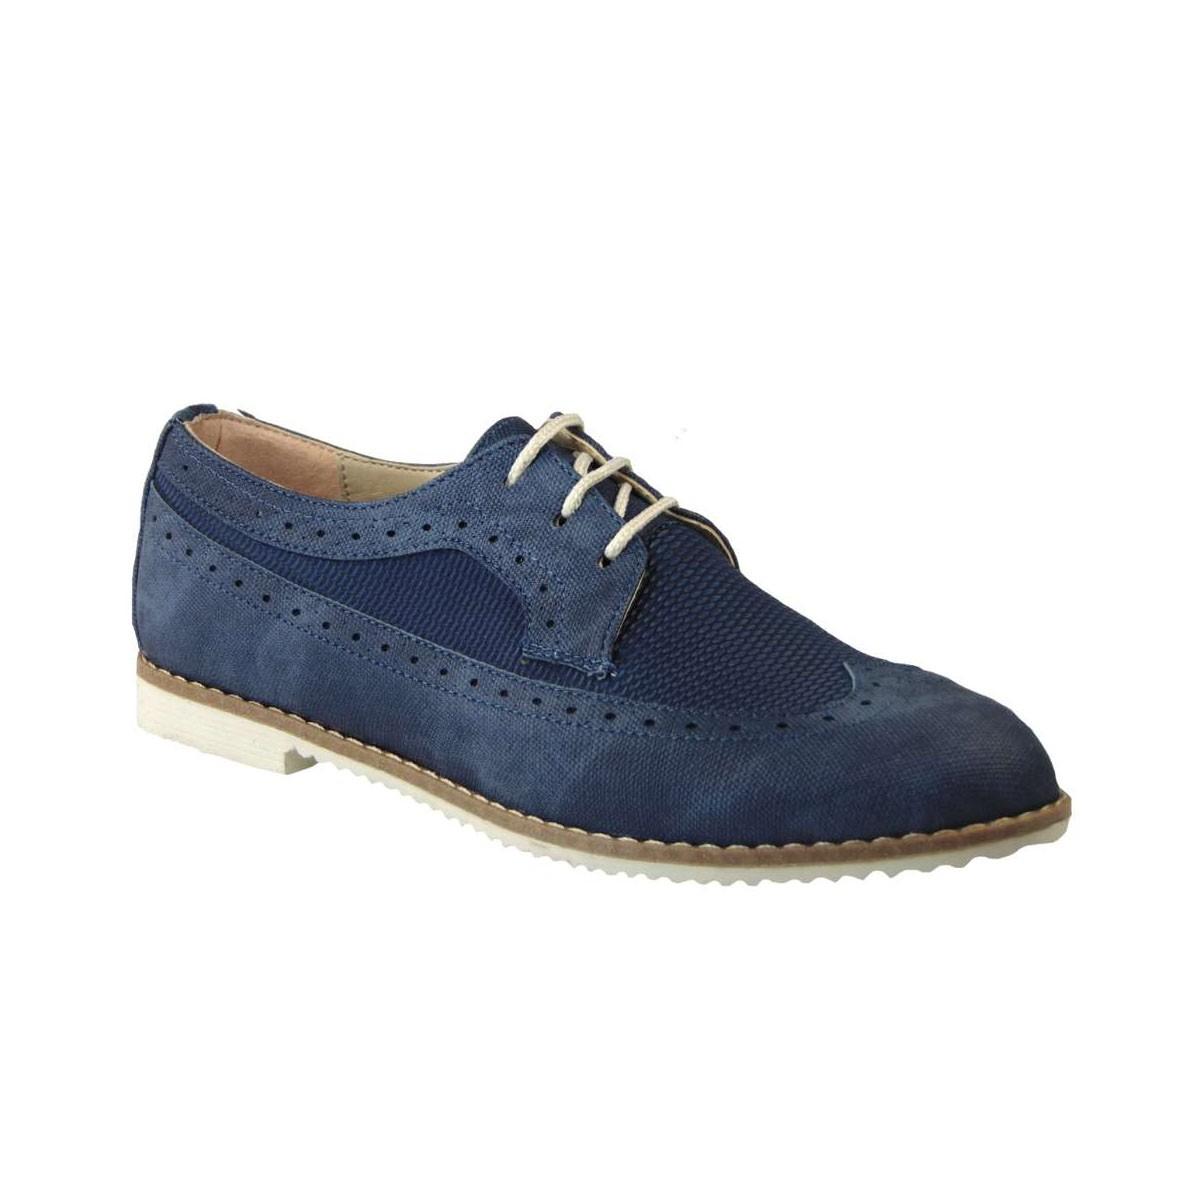 5e9c011292b Tsimpolis Shoes 068 Oxford Γυναικείο Απο Τεχνοδέρμα Μπλε